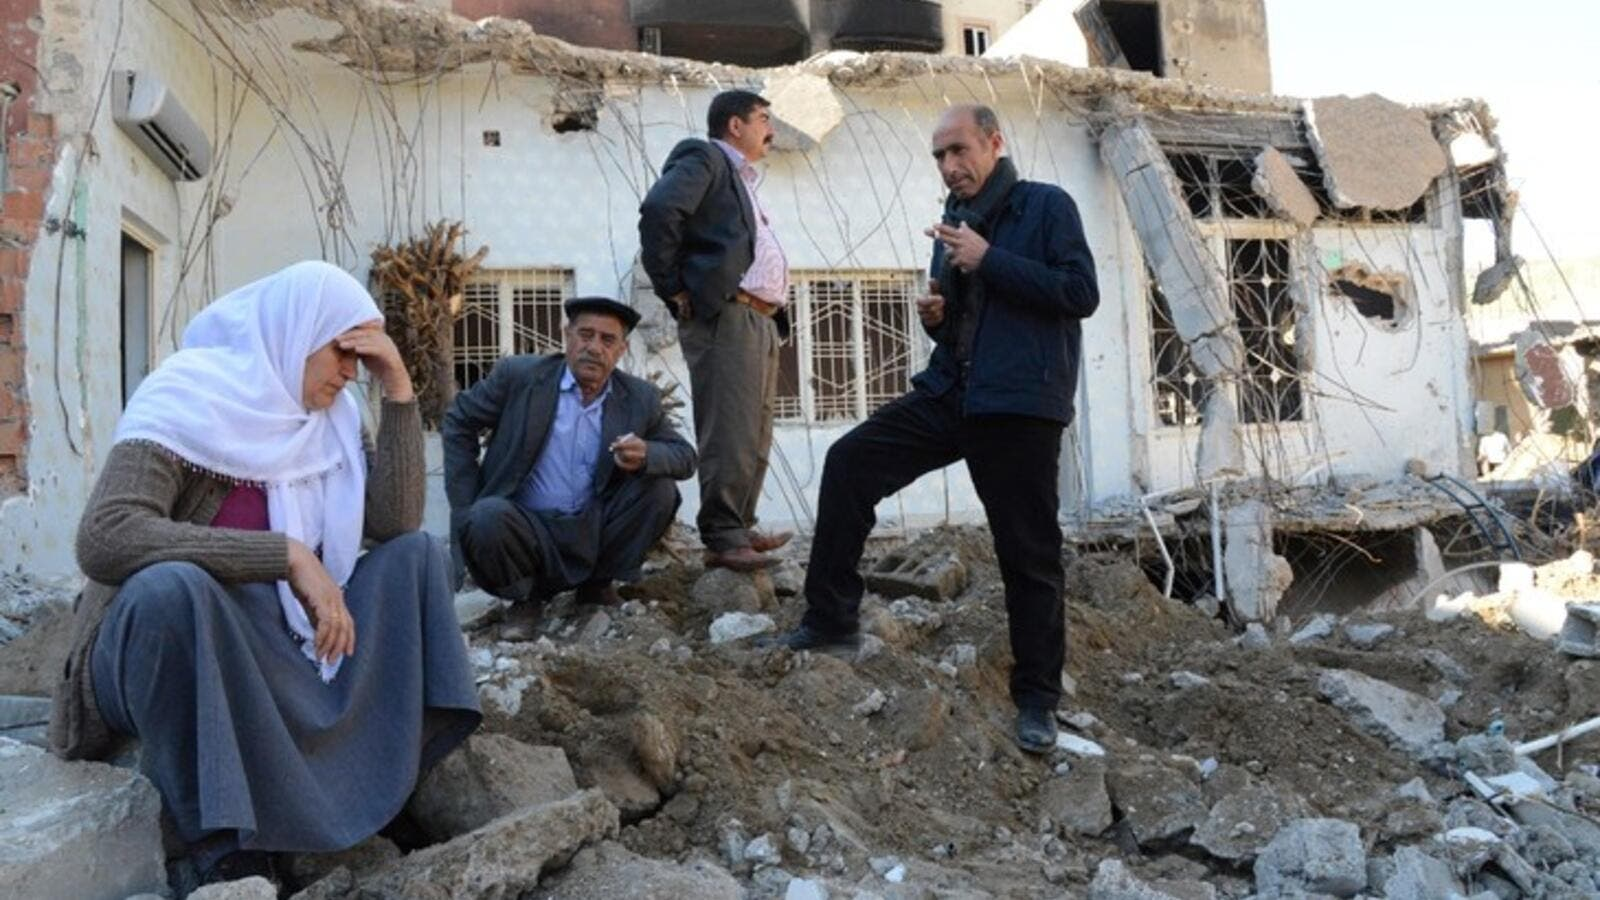 An Earthquake of Over 5.1 Magnitude Hits Western Turkey | Al Bawaba